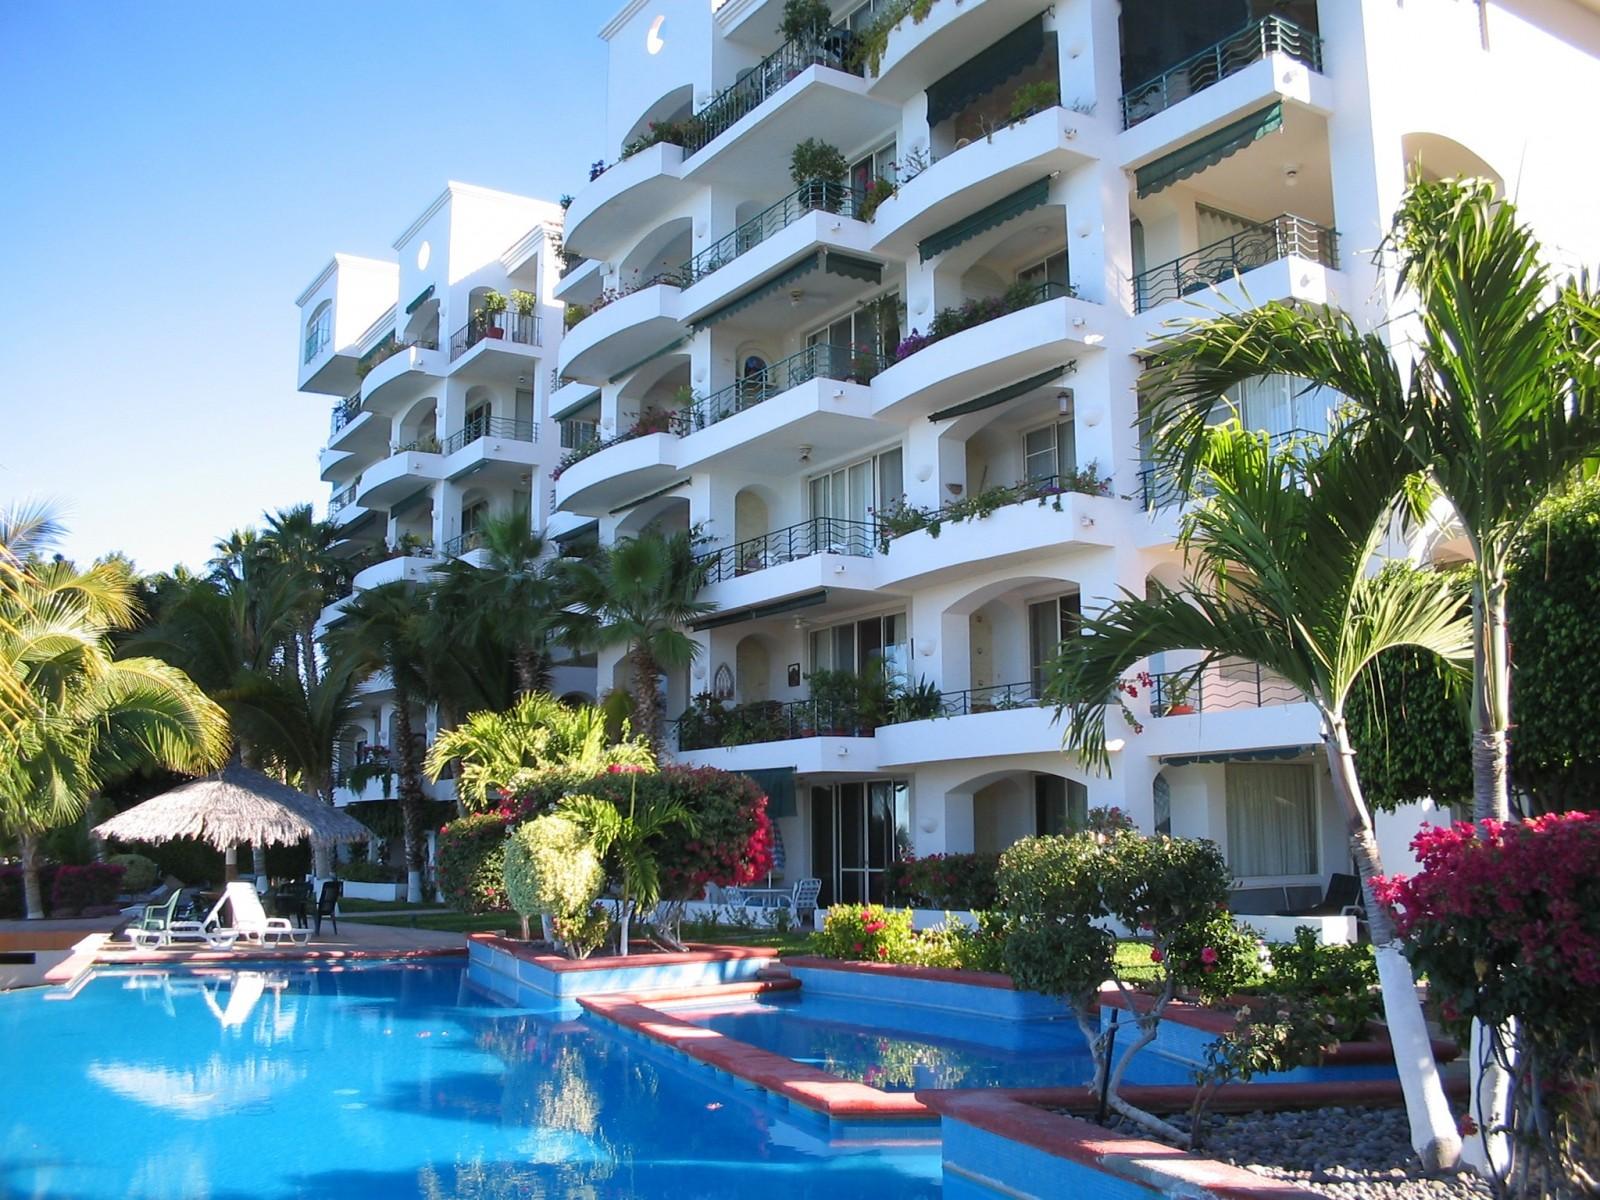 La Concha Balcony Hotel Beach Resort